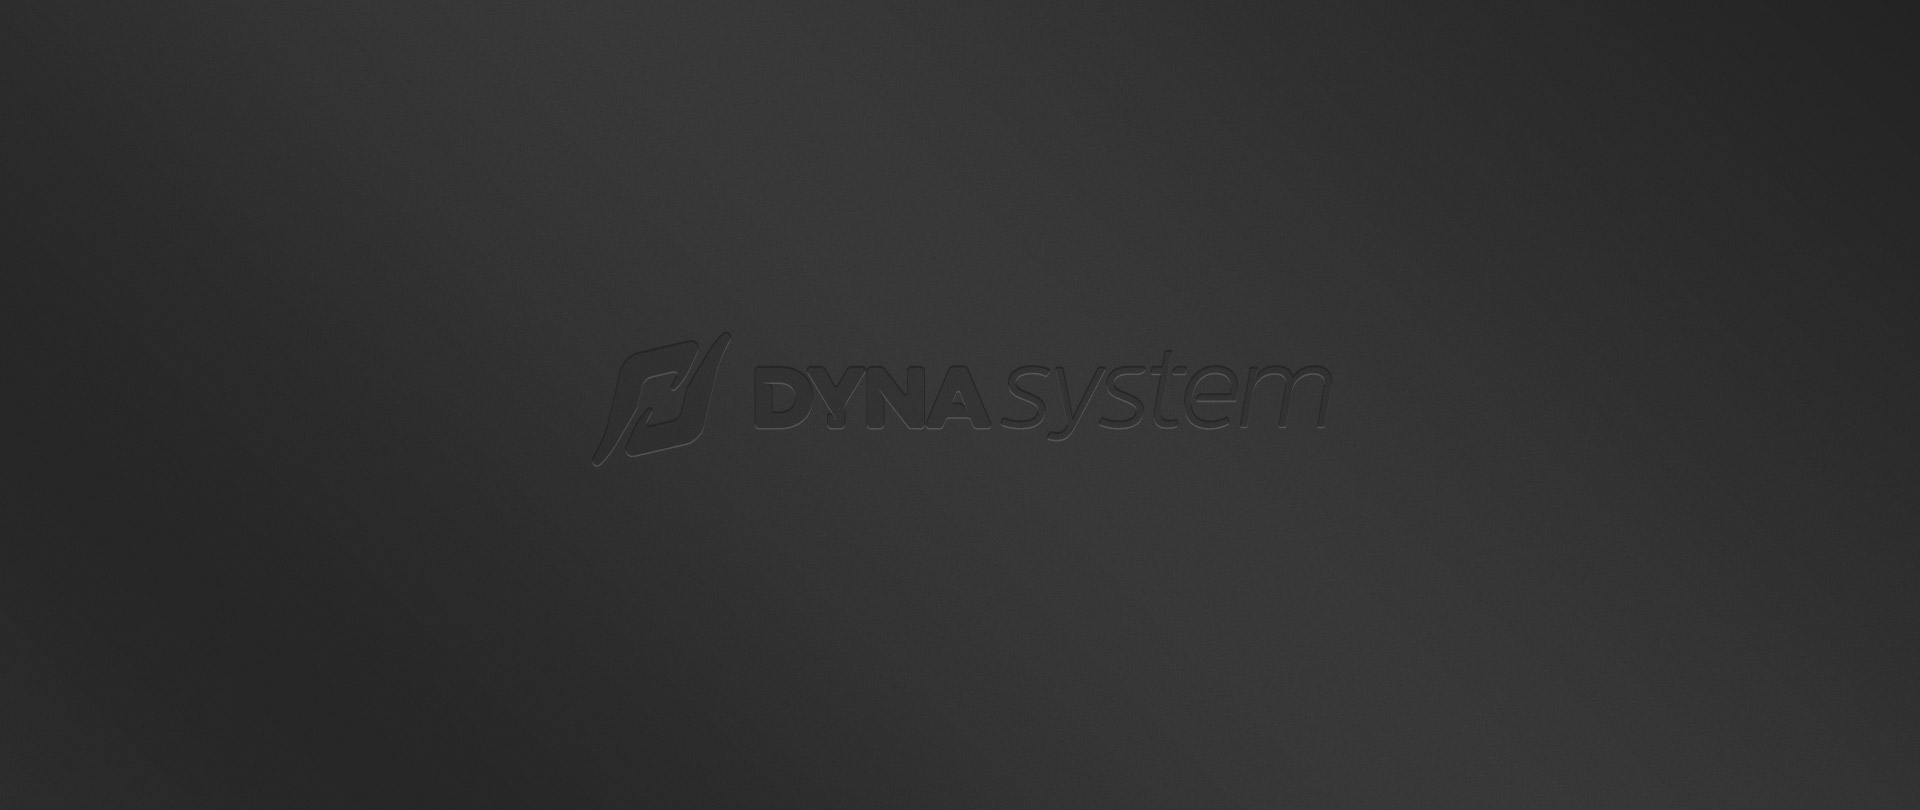 Dyna System Logo